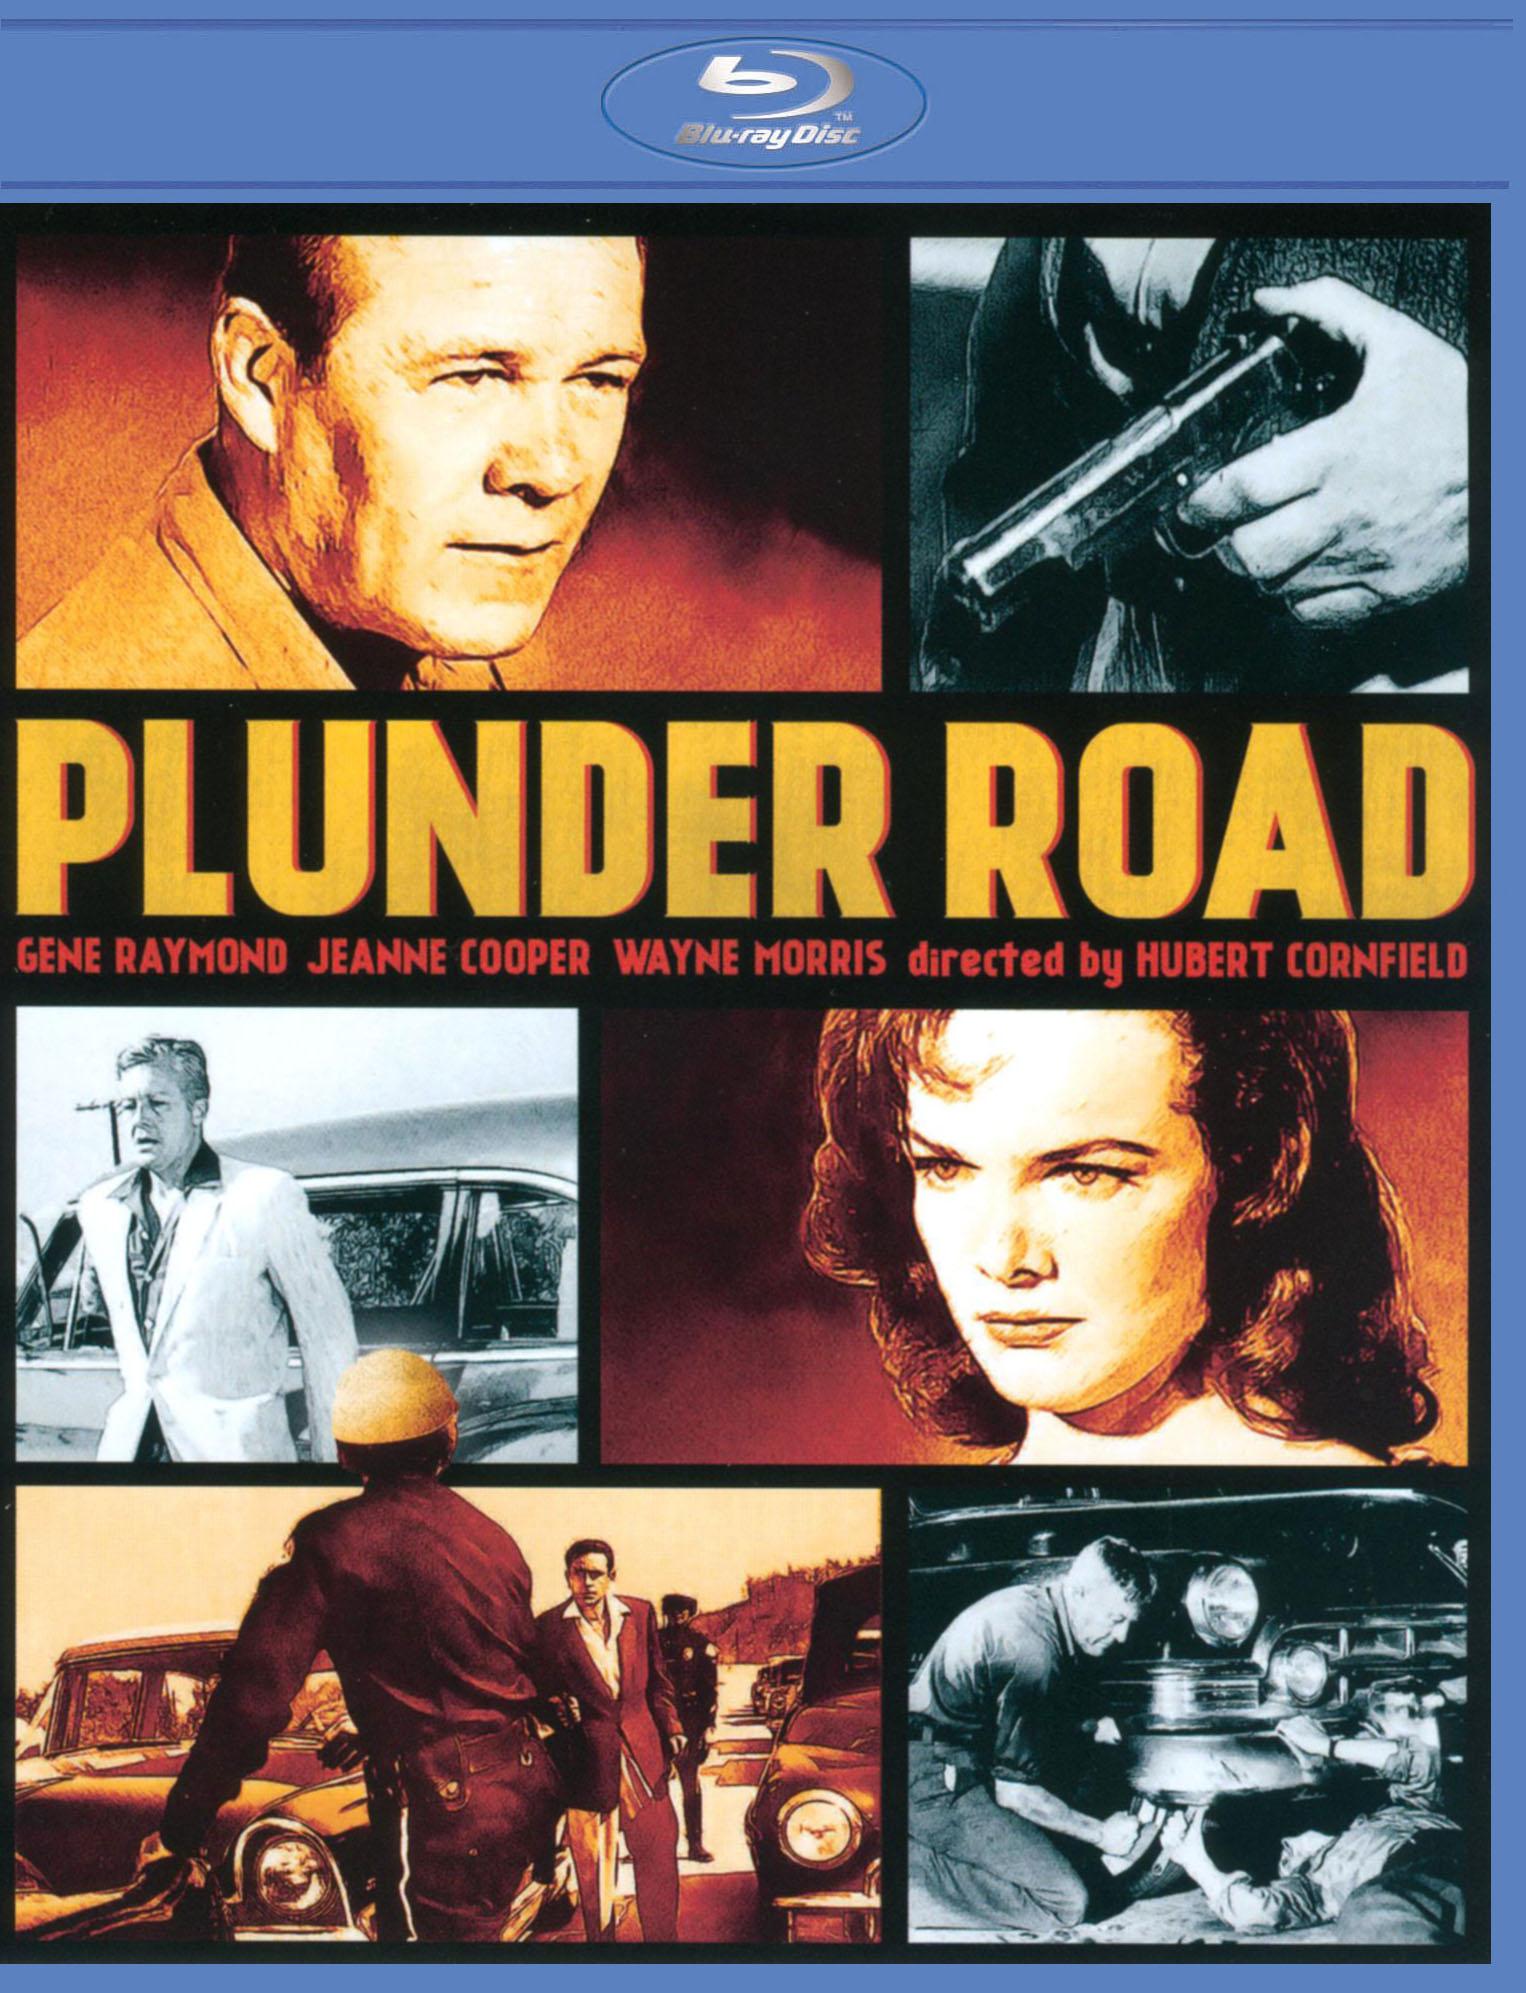 Plunder Road [blu-ray] 21701195